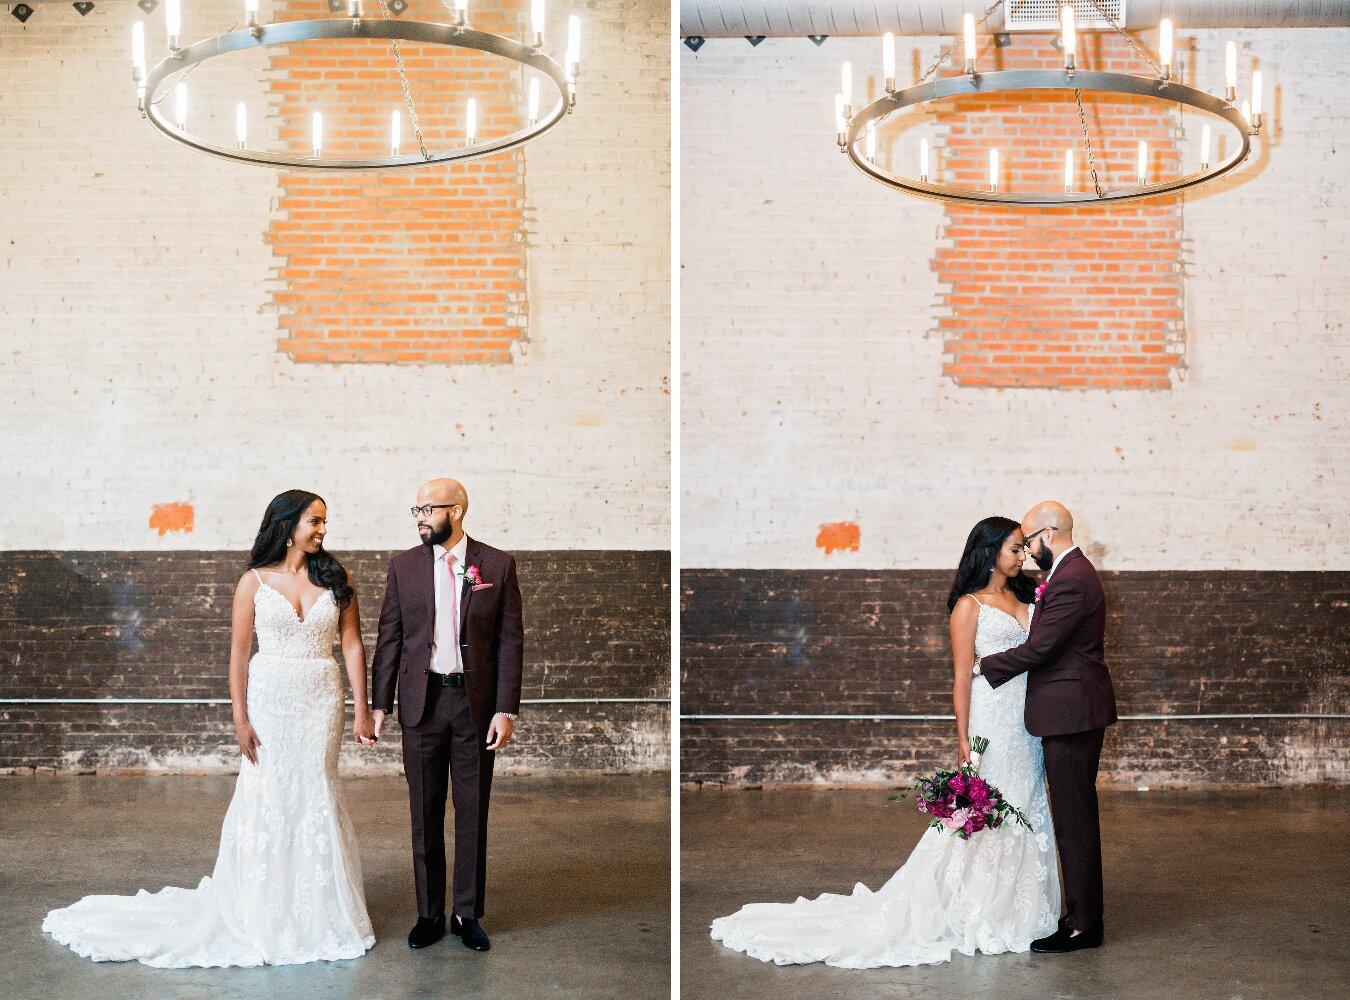 Dallas Wedding- Pharris Photography- Couple- Sophie + Kellen- Bride & Groom